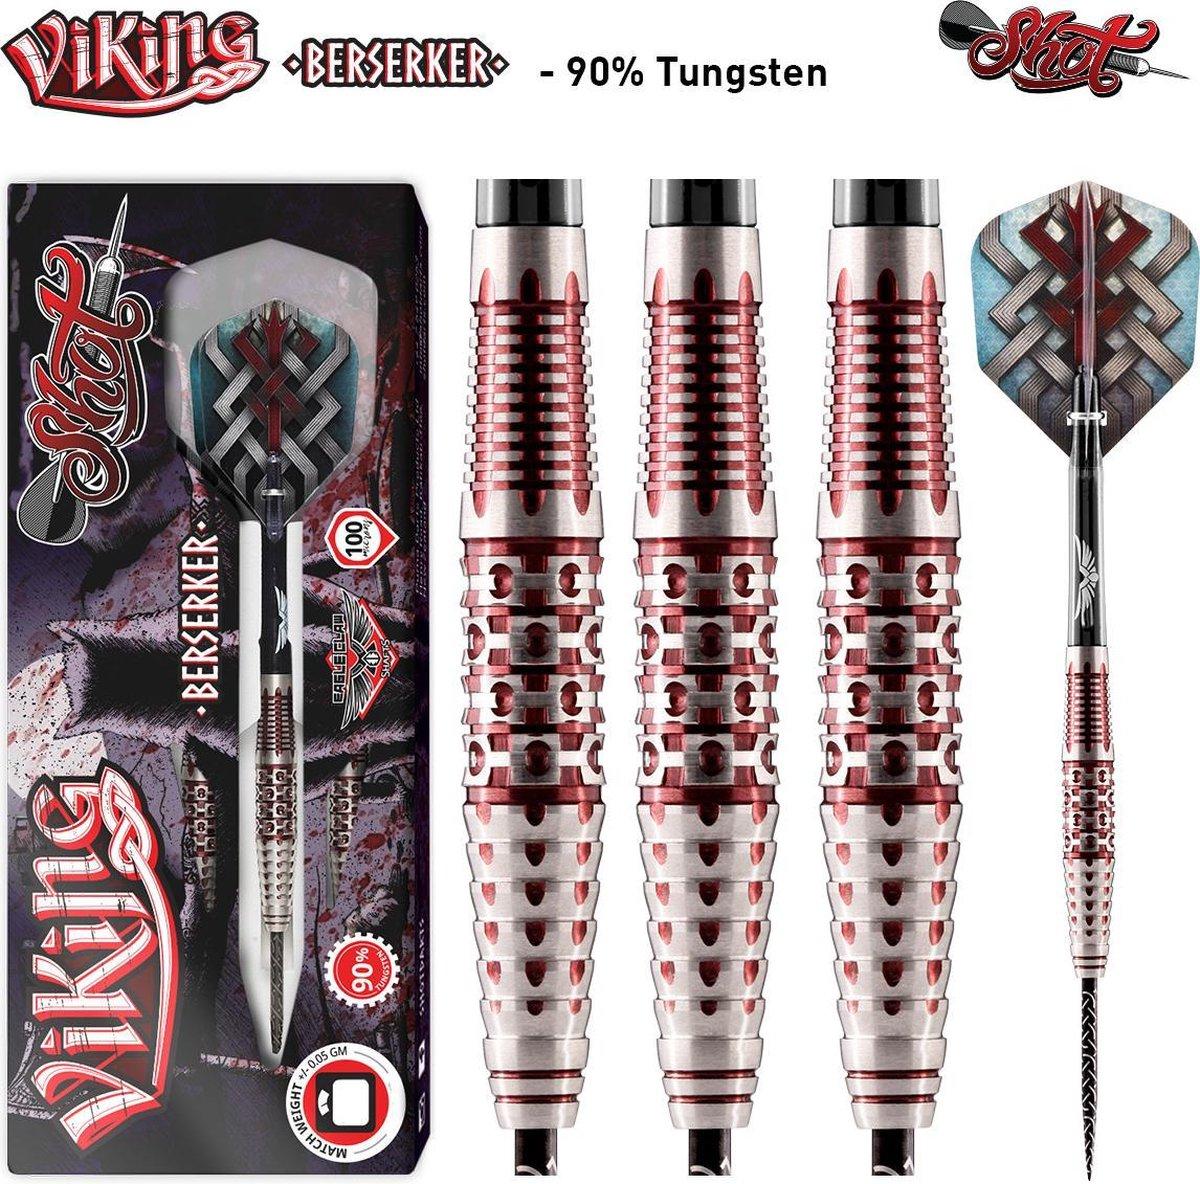 Shot! Viking Berserker 90% - 23 Gram